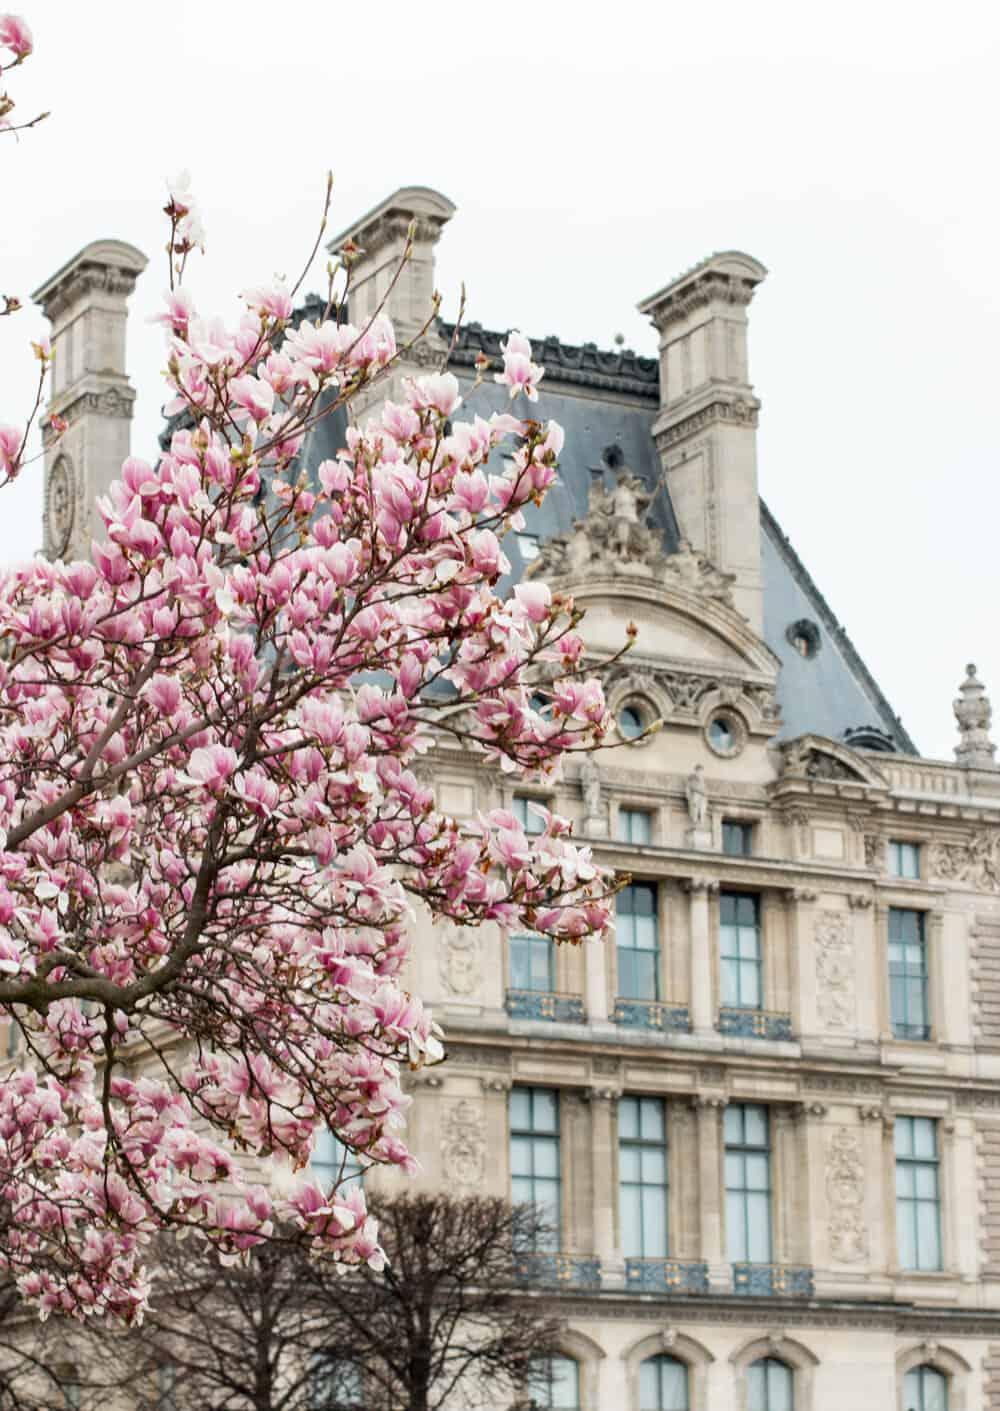 Shop Magnolias in Bloom Tuileries Paris Here